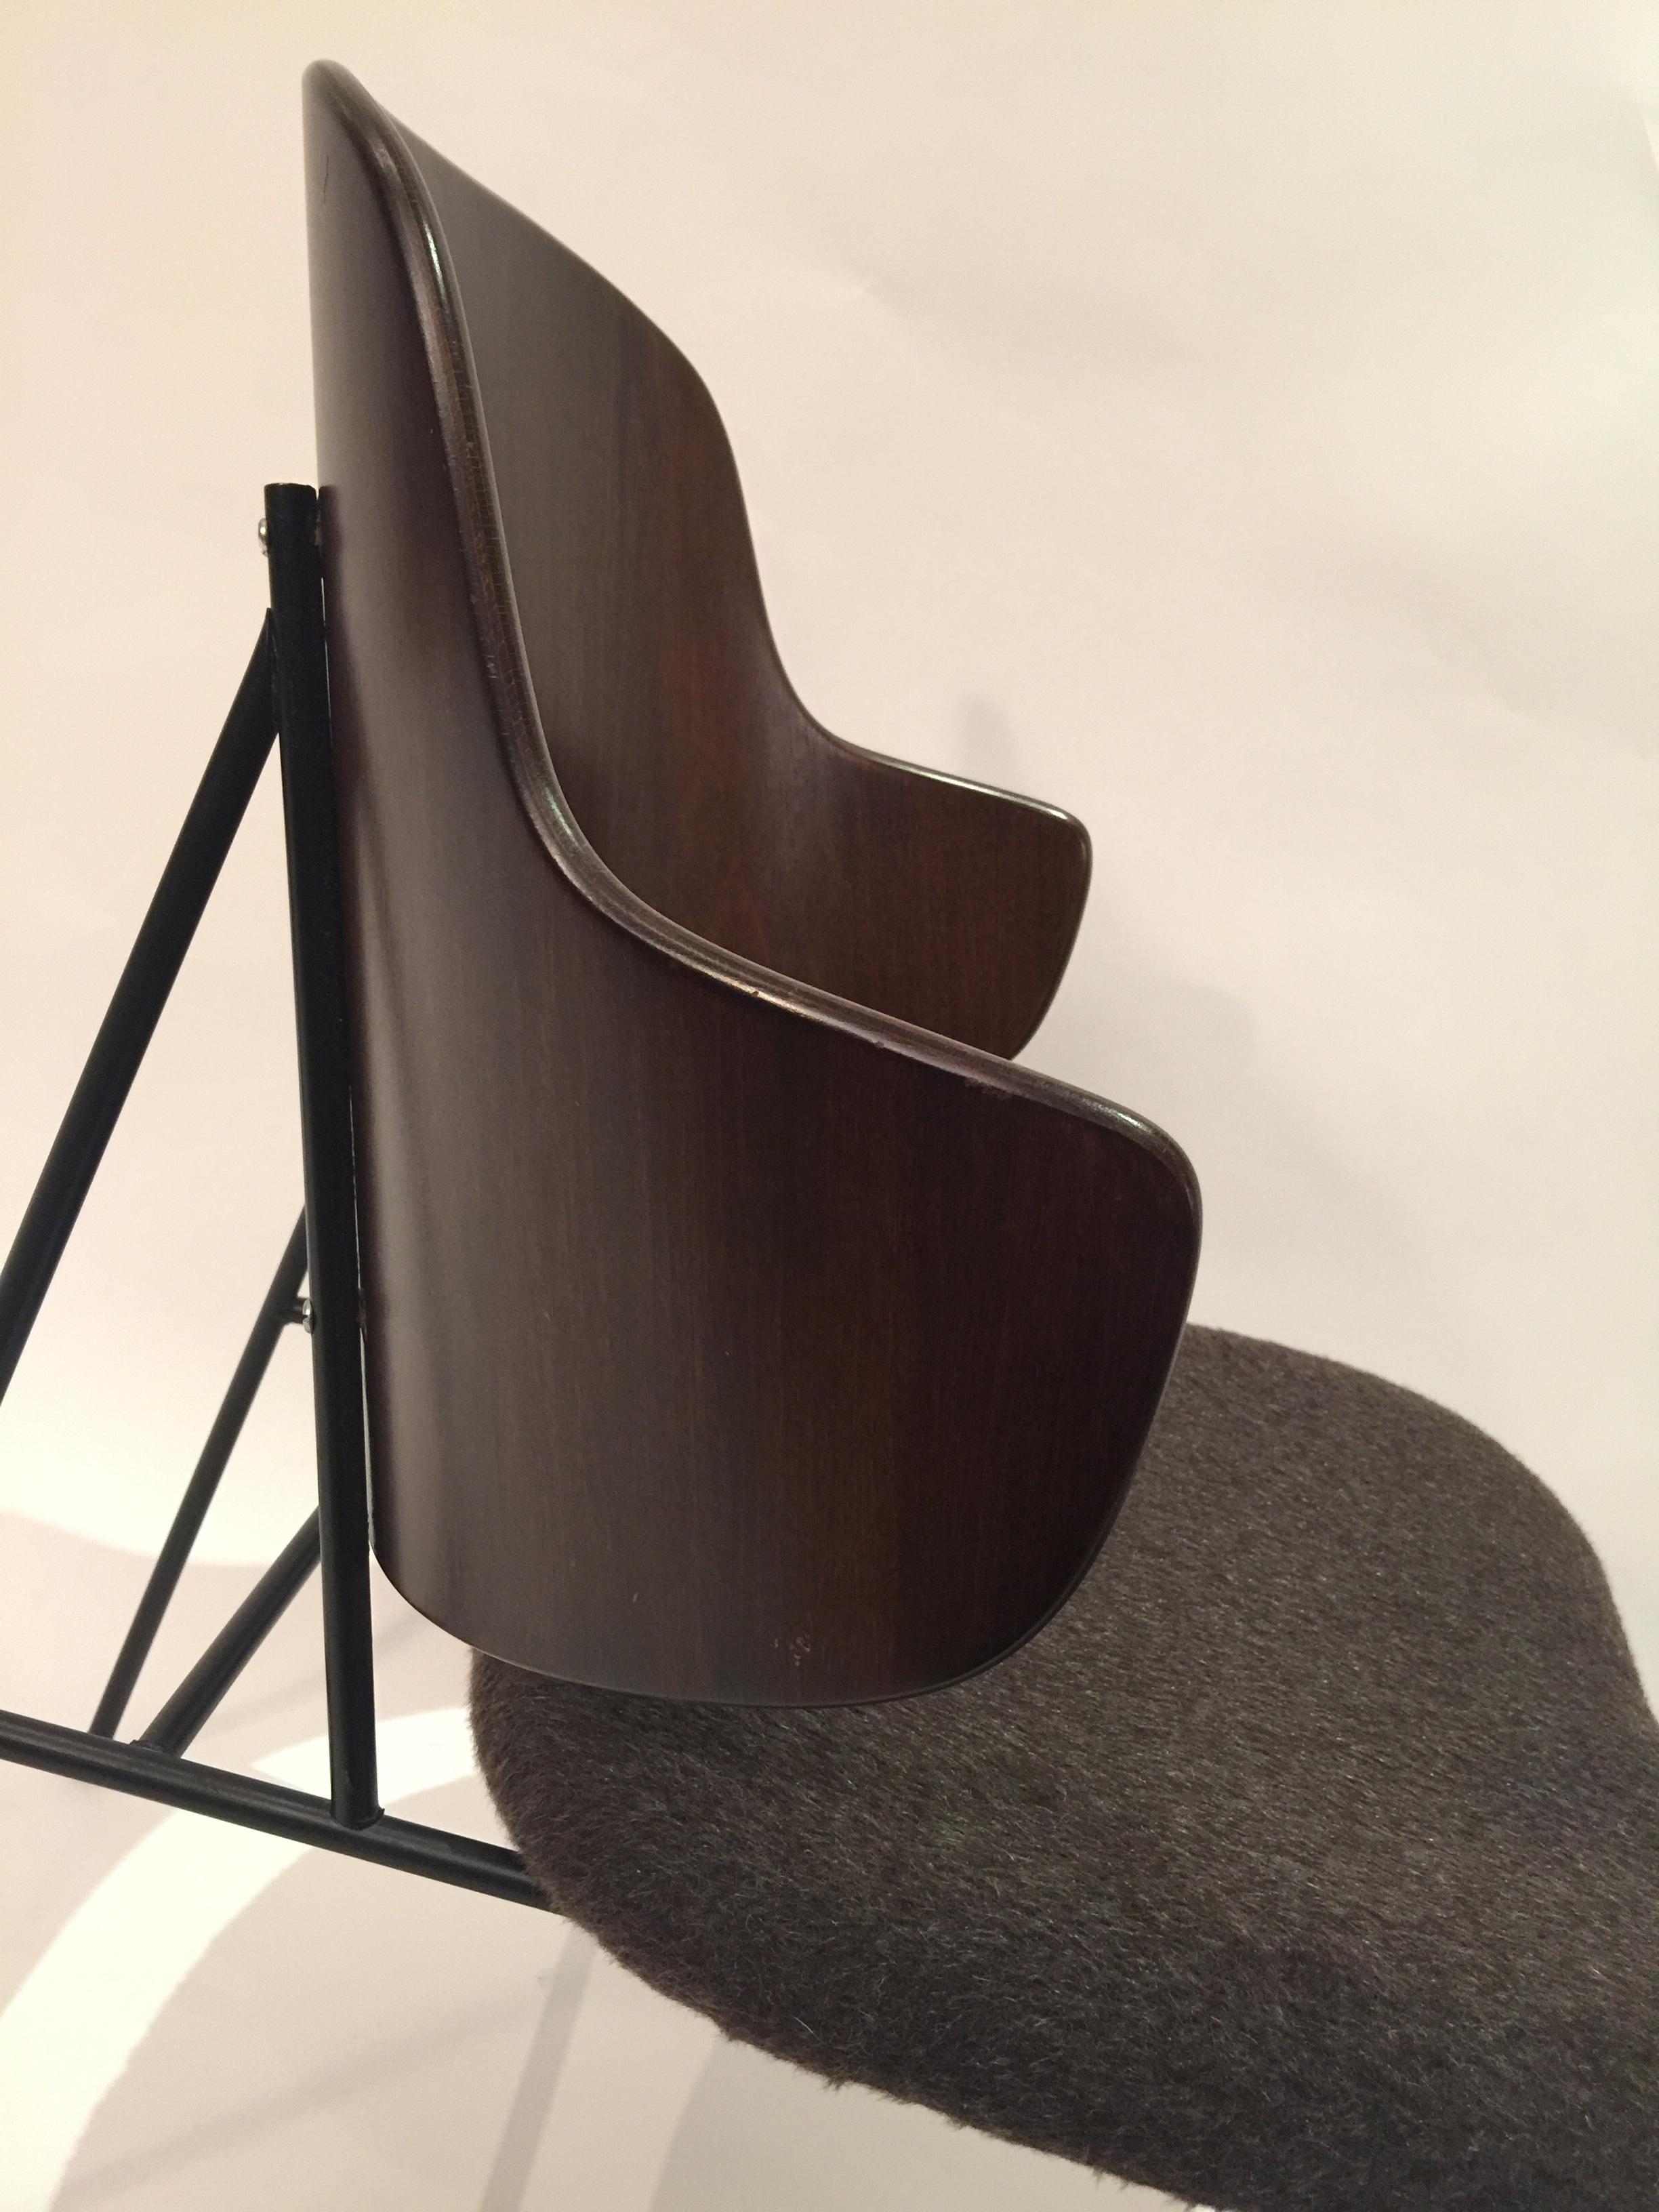 Ib Kofod-Larsen %22Penguin%22 Chair 5.JPG